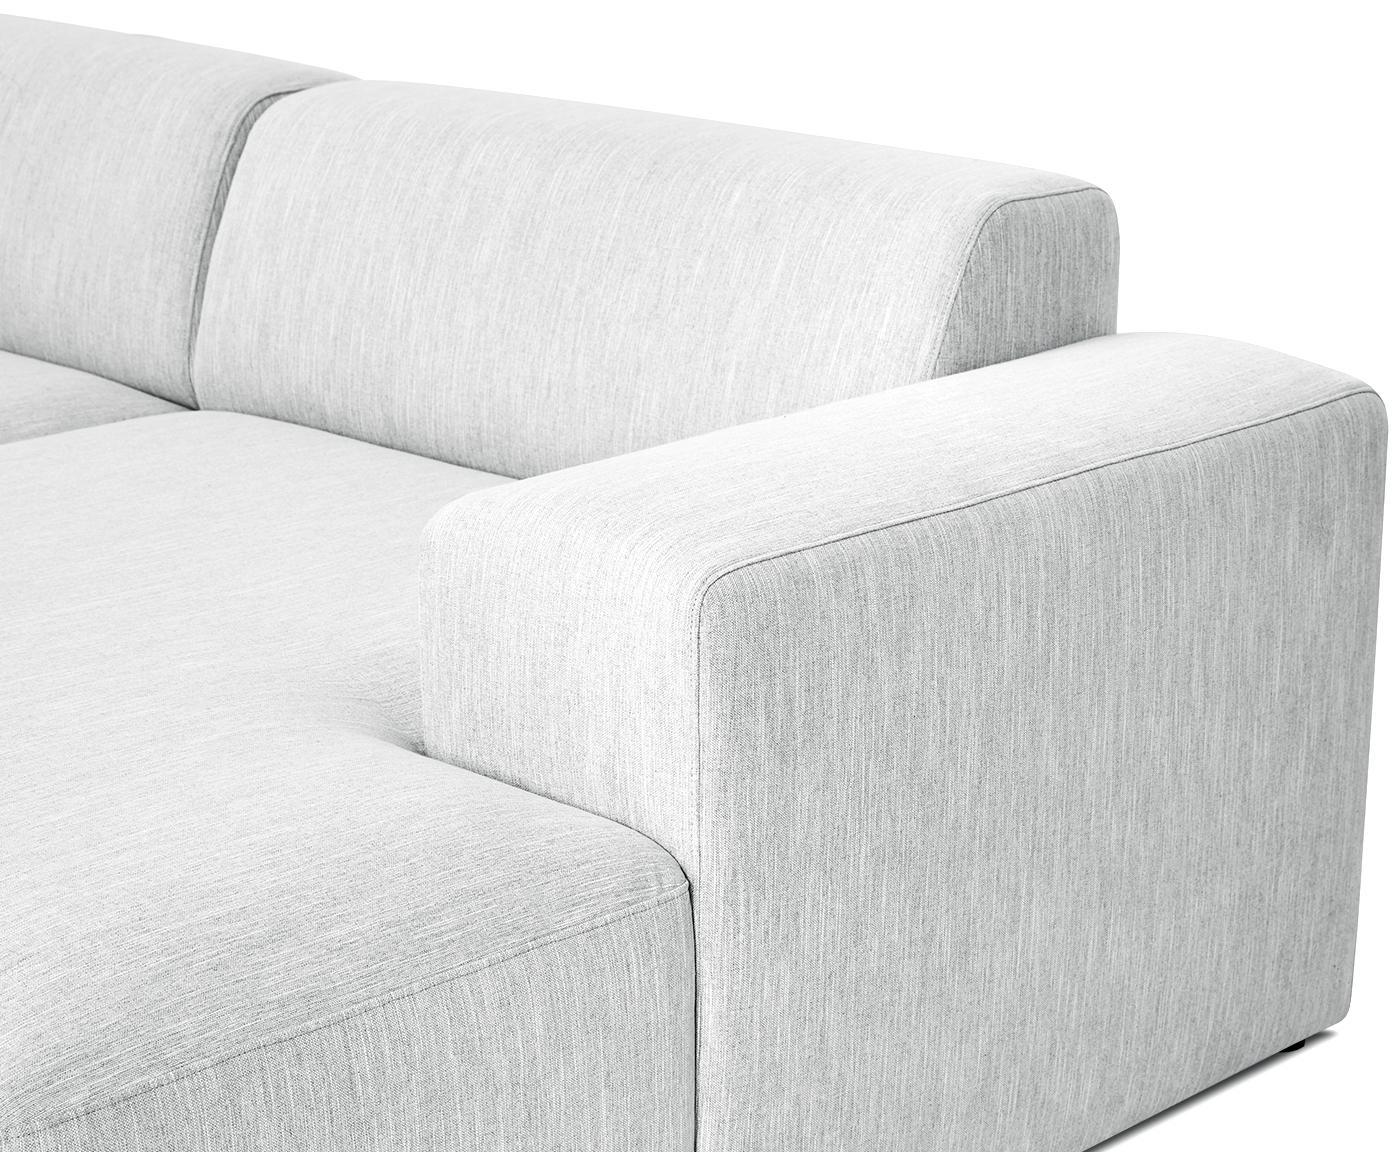 Ecksofa Melva (4-Sitzer), Bezug: Polyester 35.000 Scheuert, Gestell: Massives Kiefernholz, Spa, Webstoff Hellgrau, B 319 x T 144 cm